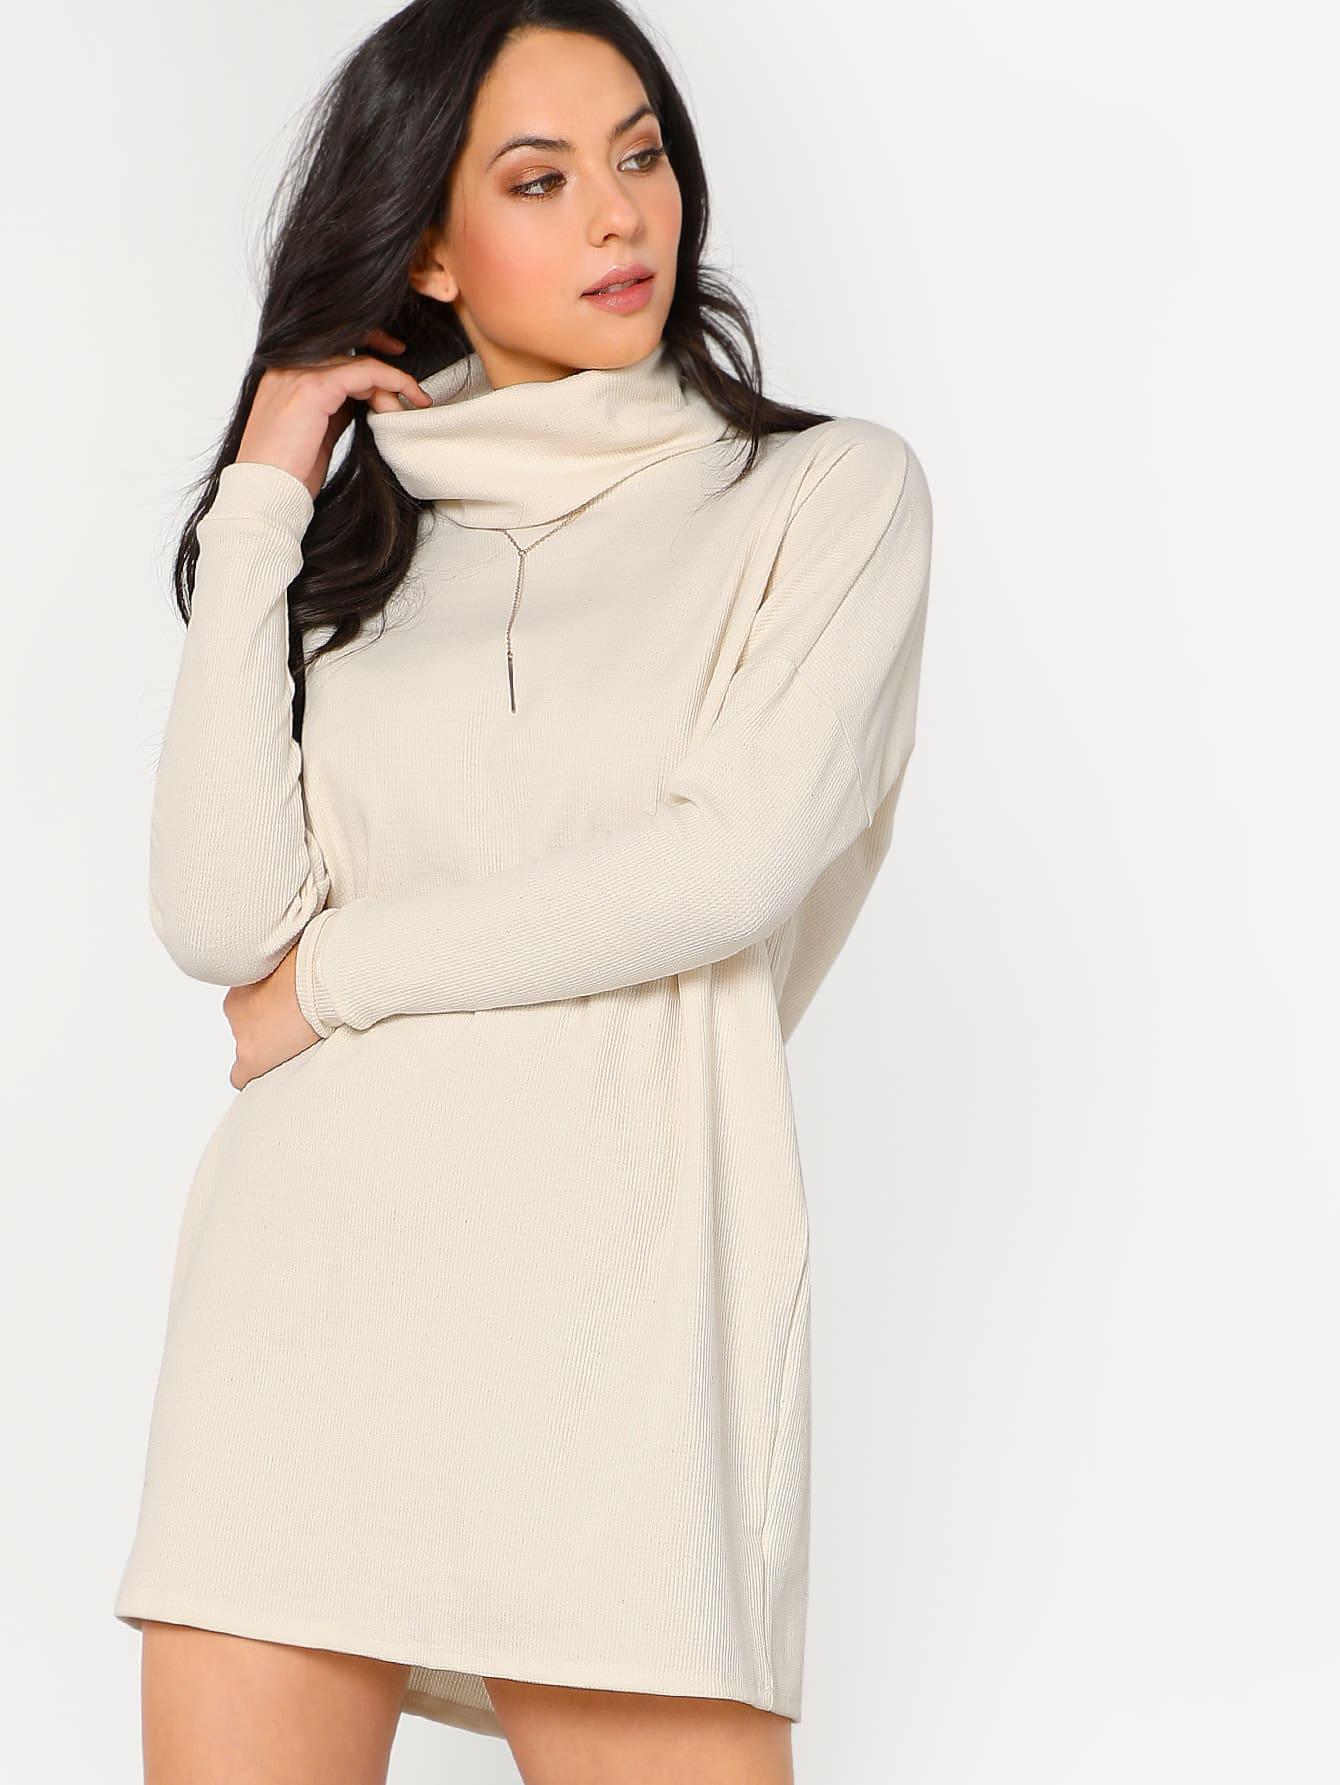 Long sleeved turtleneck sweater dress shein sheinside for Long sleeve turtleneck wedding dress